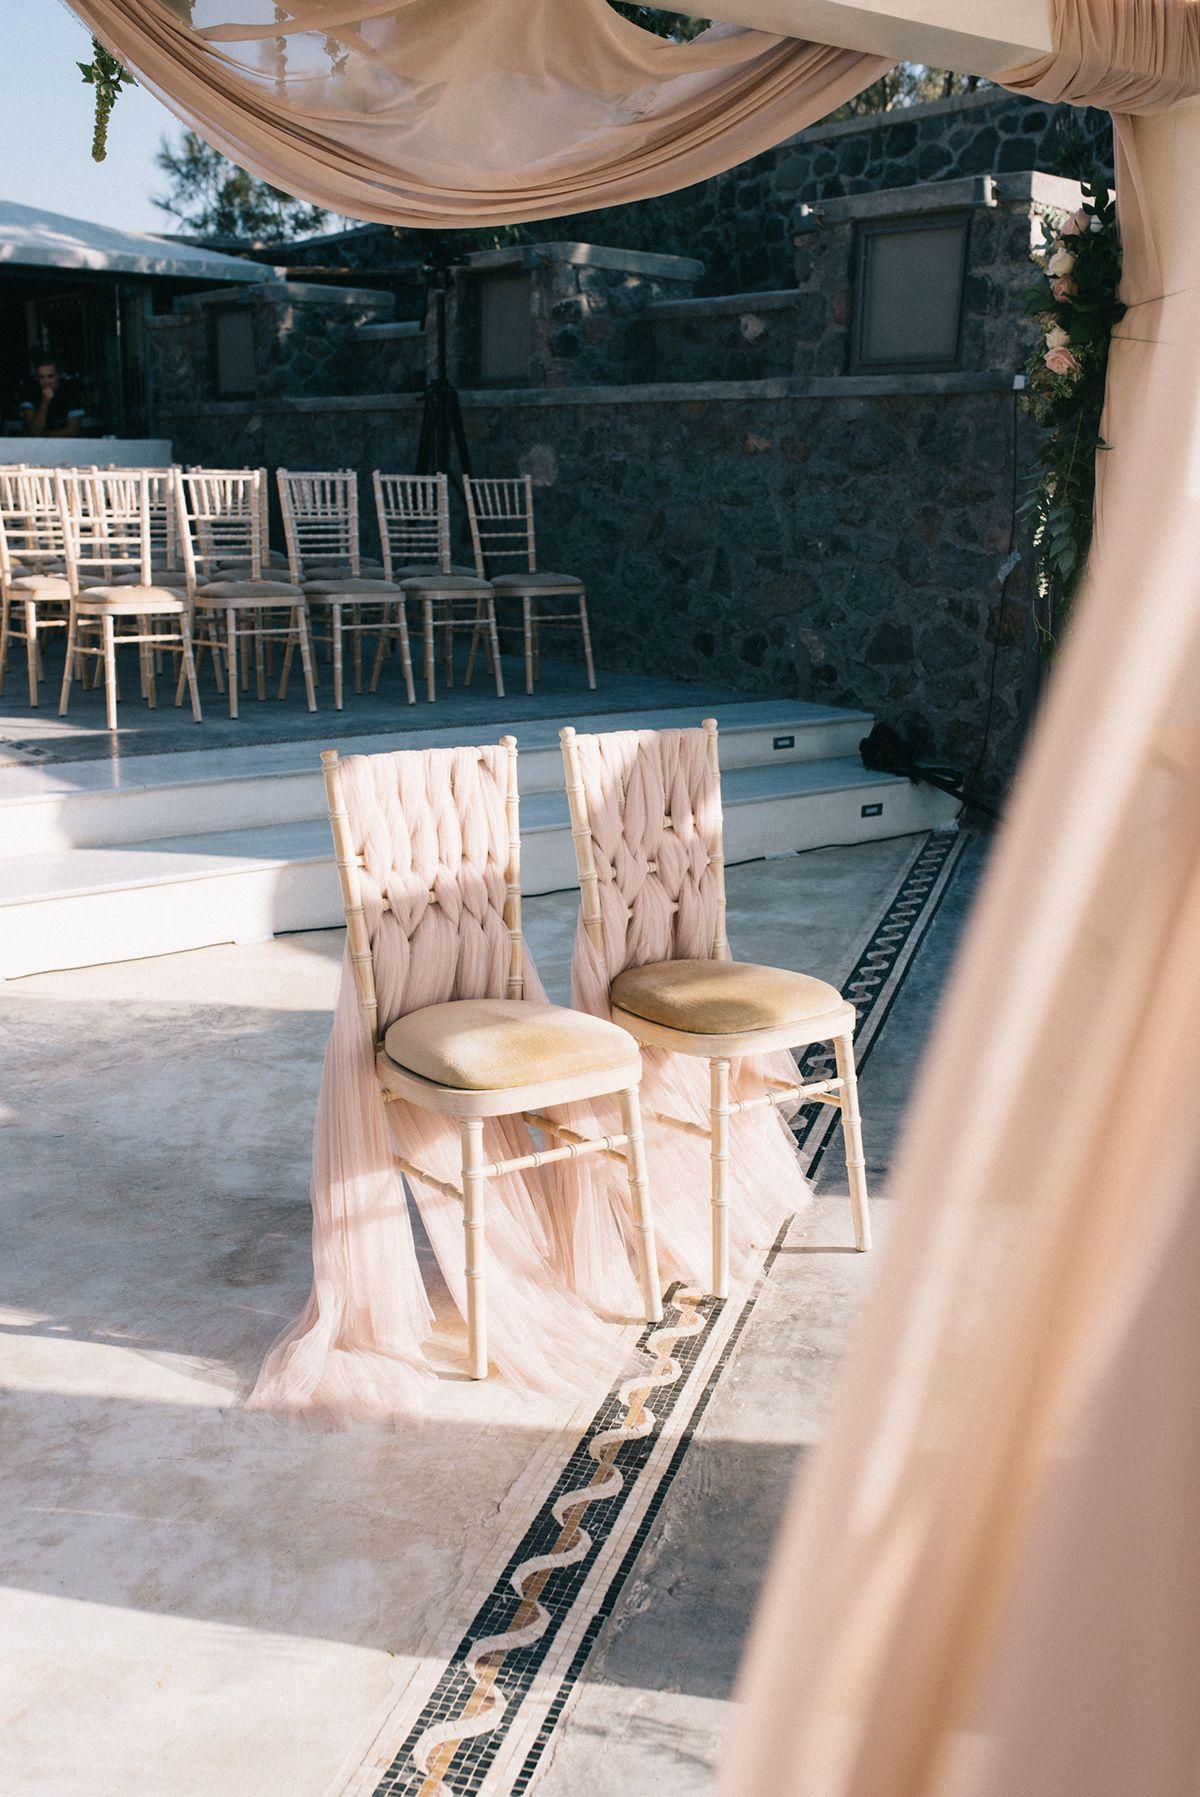 La-boda-de-MarC3ADa-JosC3A9-SuC3A1rez-y-Jordi-Nieto-60.jpg